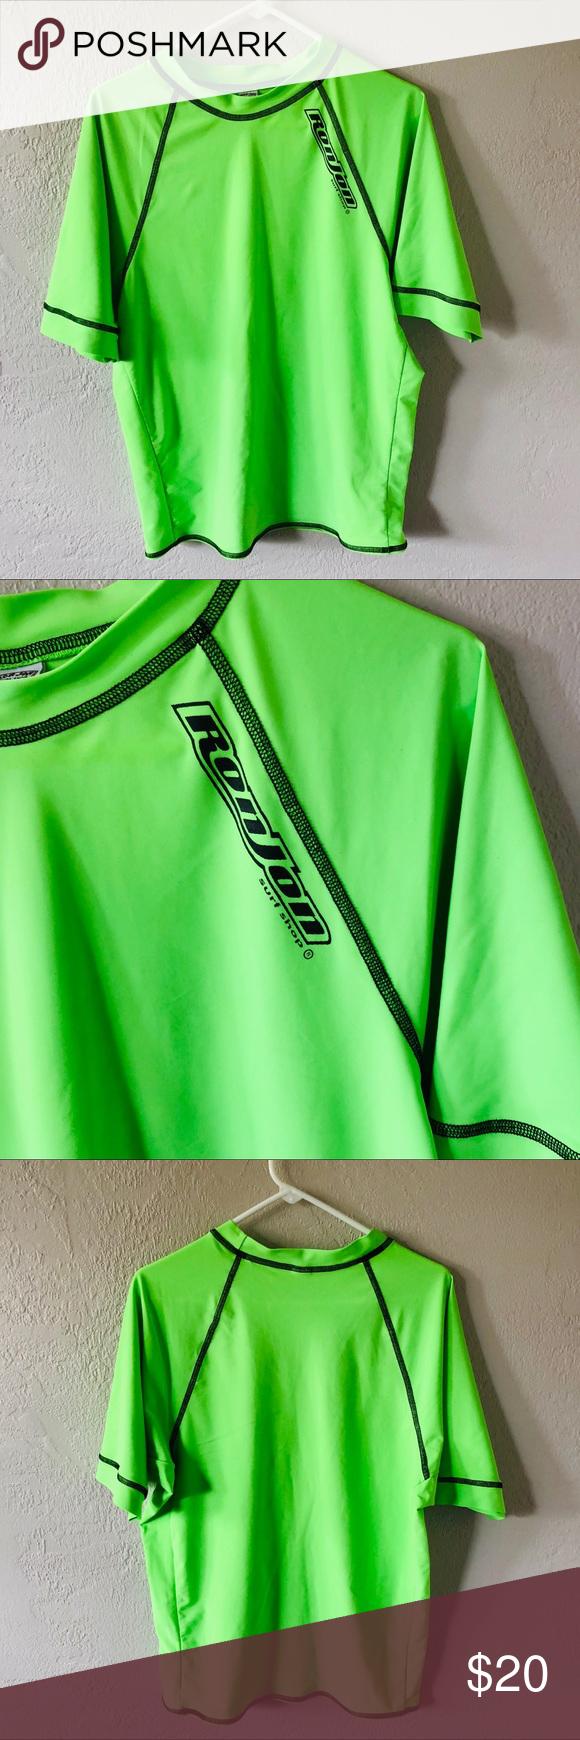 515de4056c Ronjon Neon Green Swim Shirt 3X Ronjon Neon Green Swim Shirt 3X Excellent  condition Ron Jon Swim Rash Guards